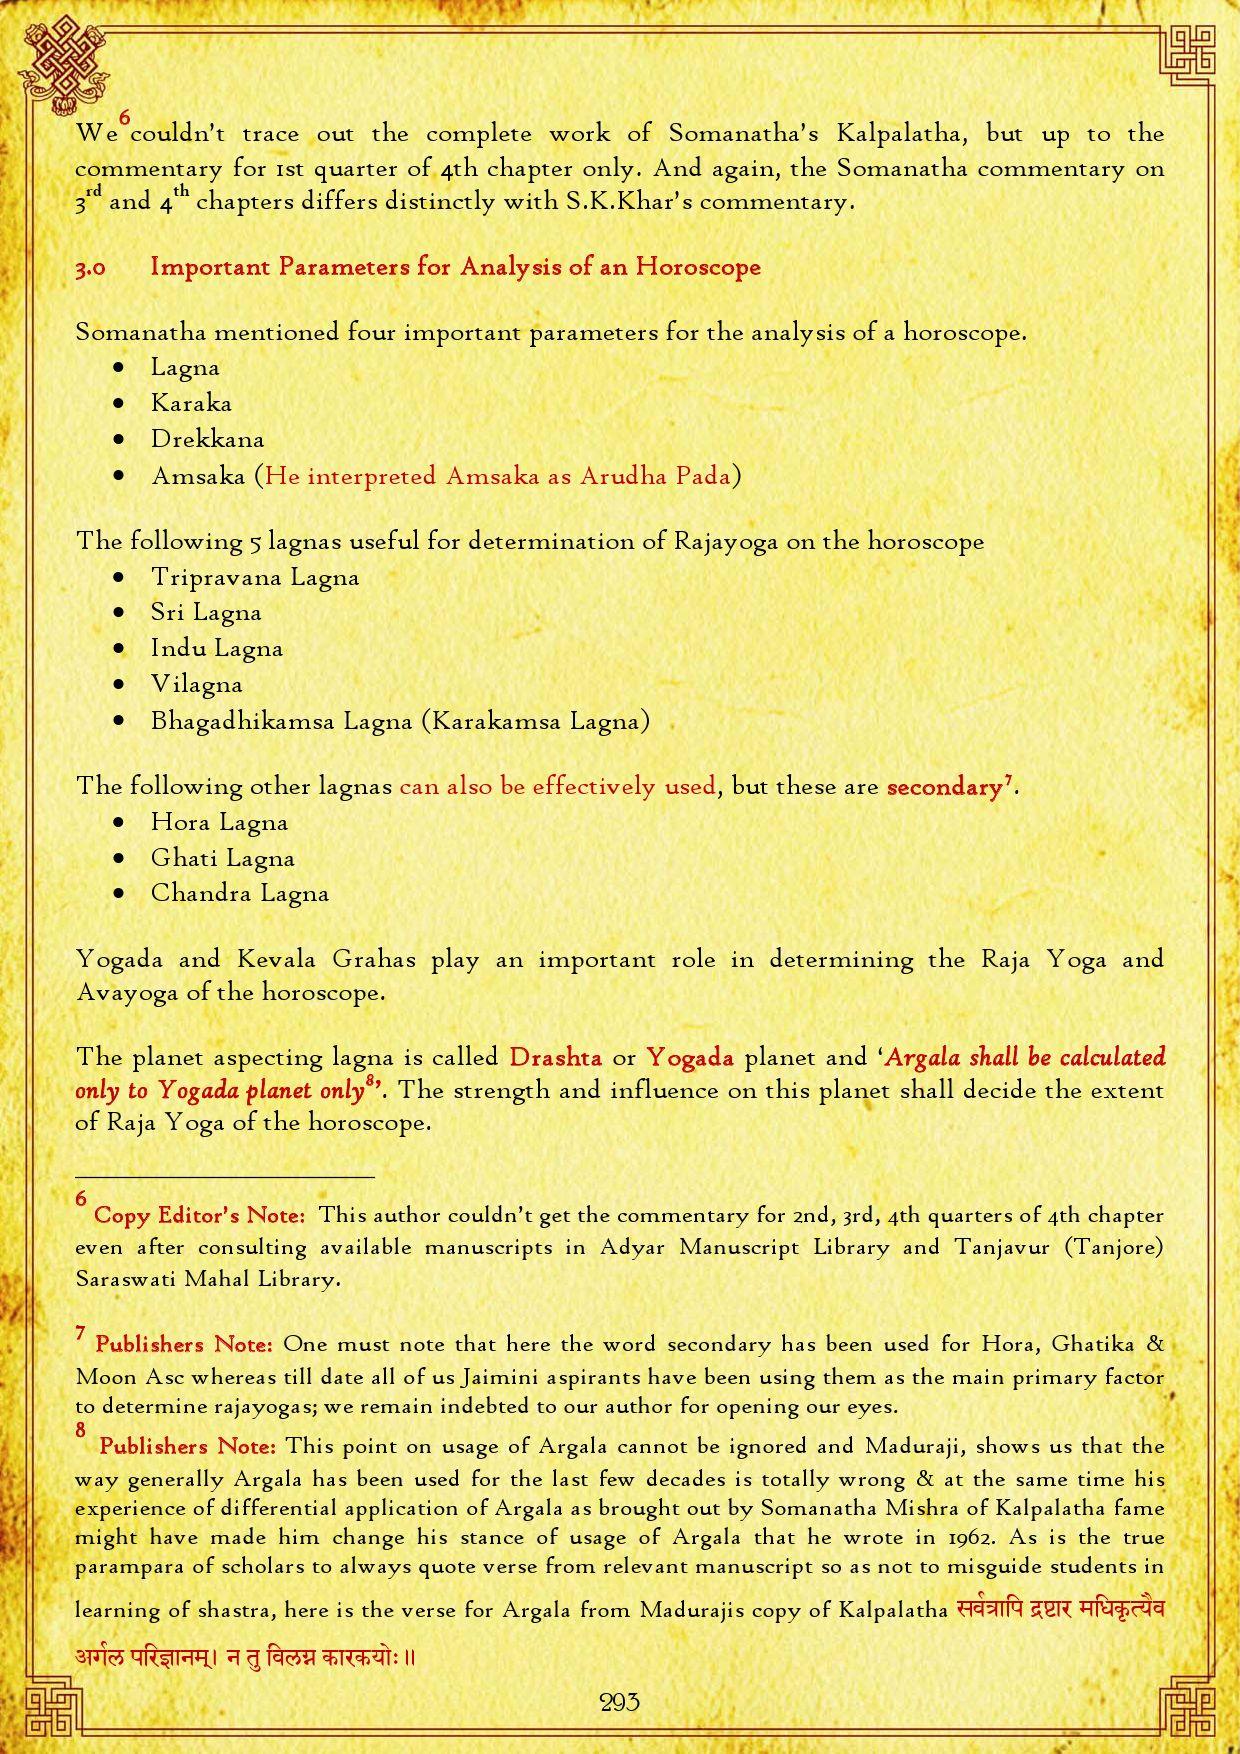 Microsoft Word - 29-Jaimini Sastra-A Revelation by